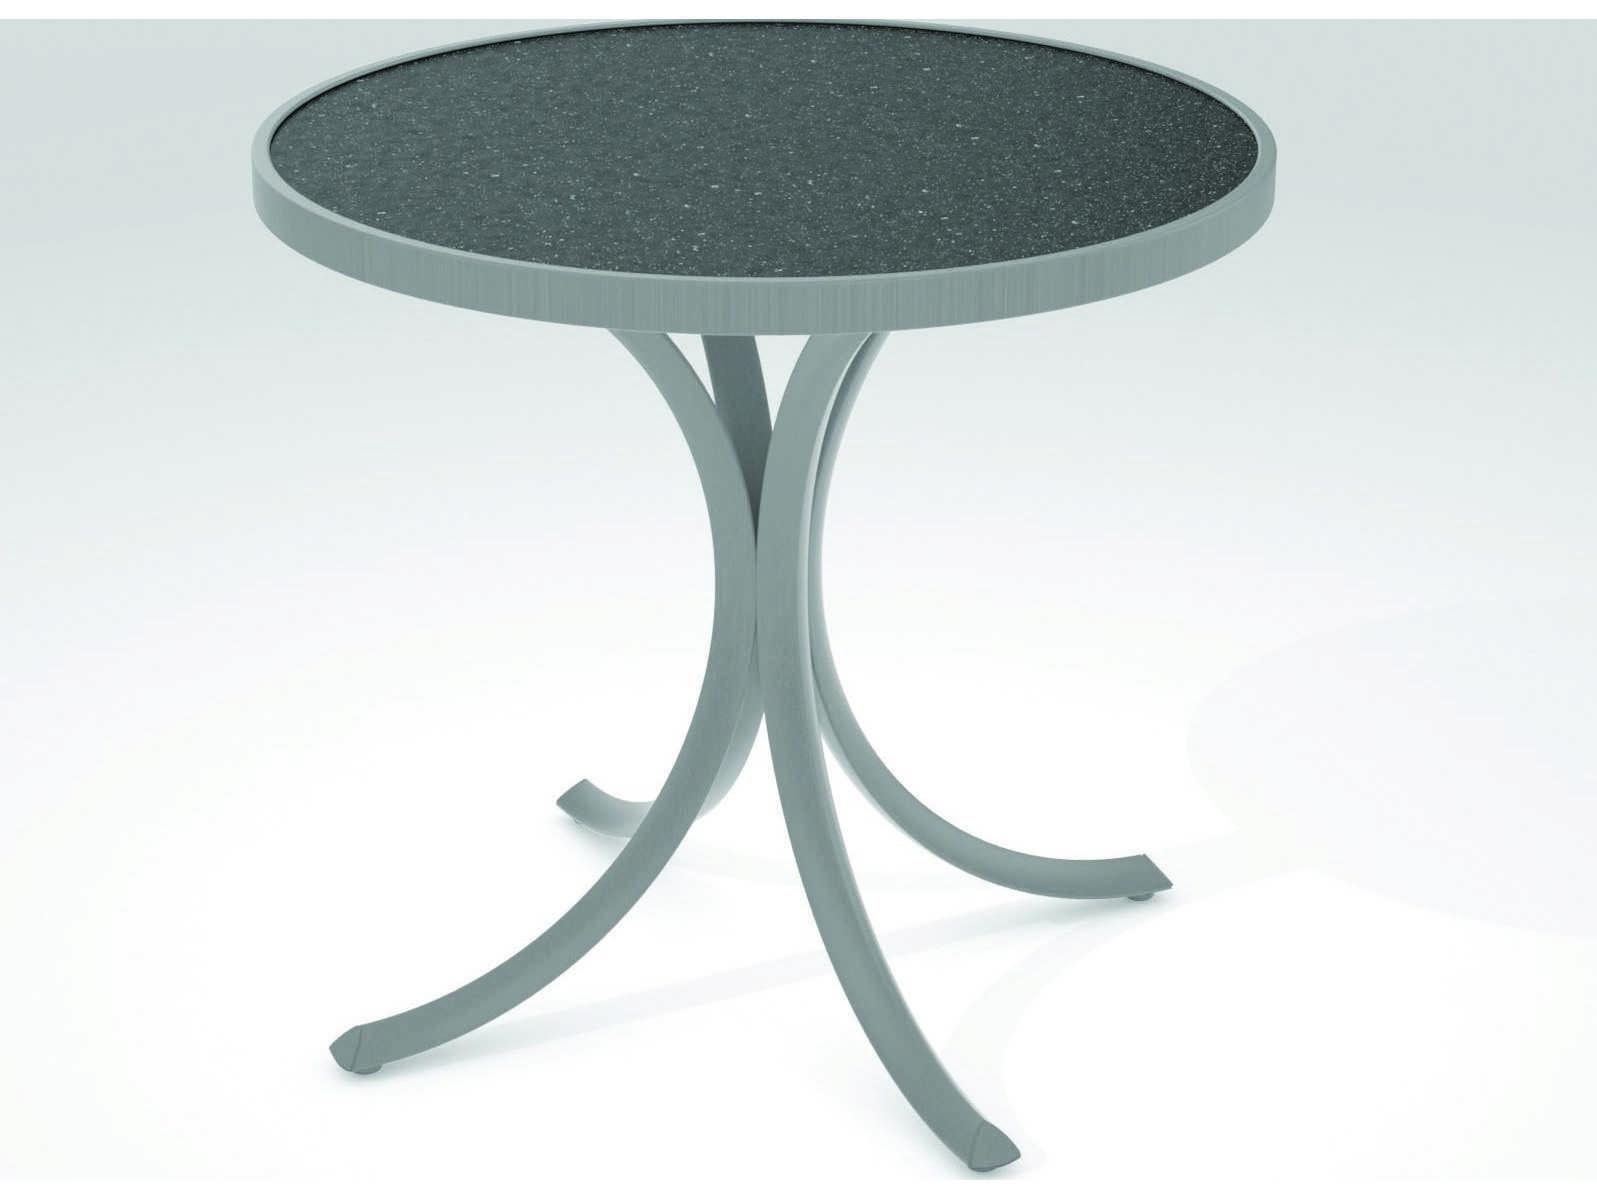 Tropitone Hpl Raduno Aluminum 30 Round Dining Table 1874h